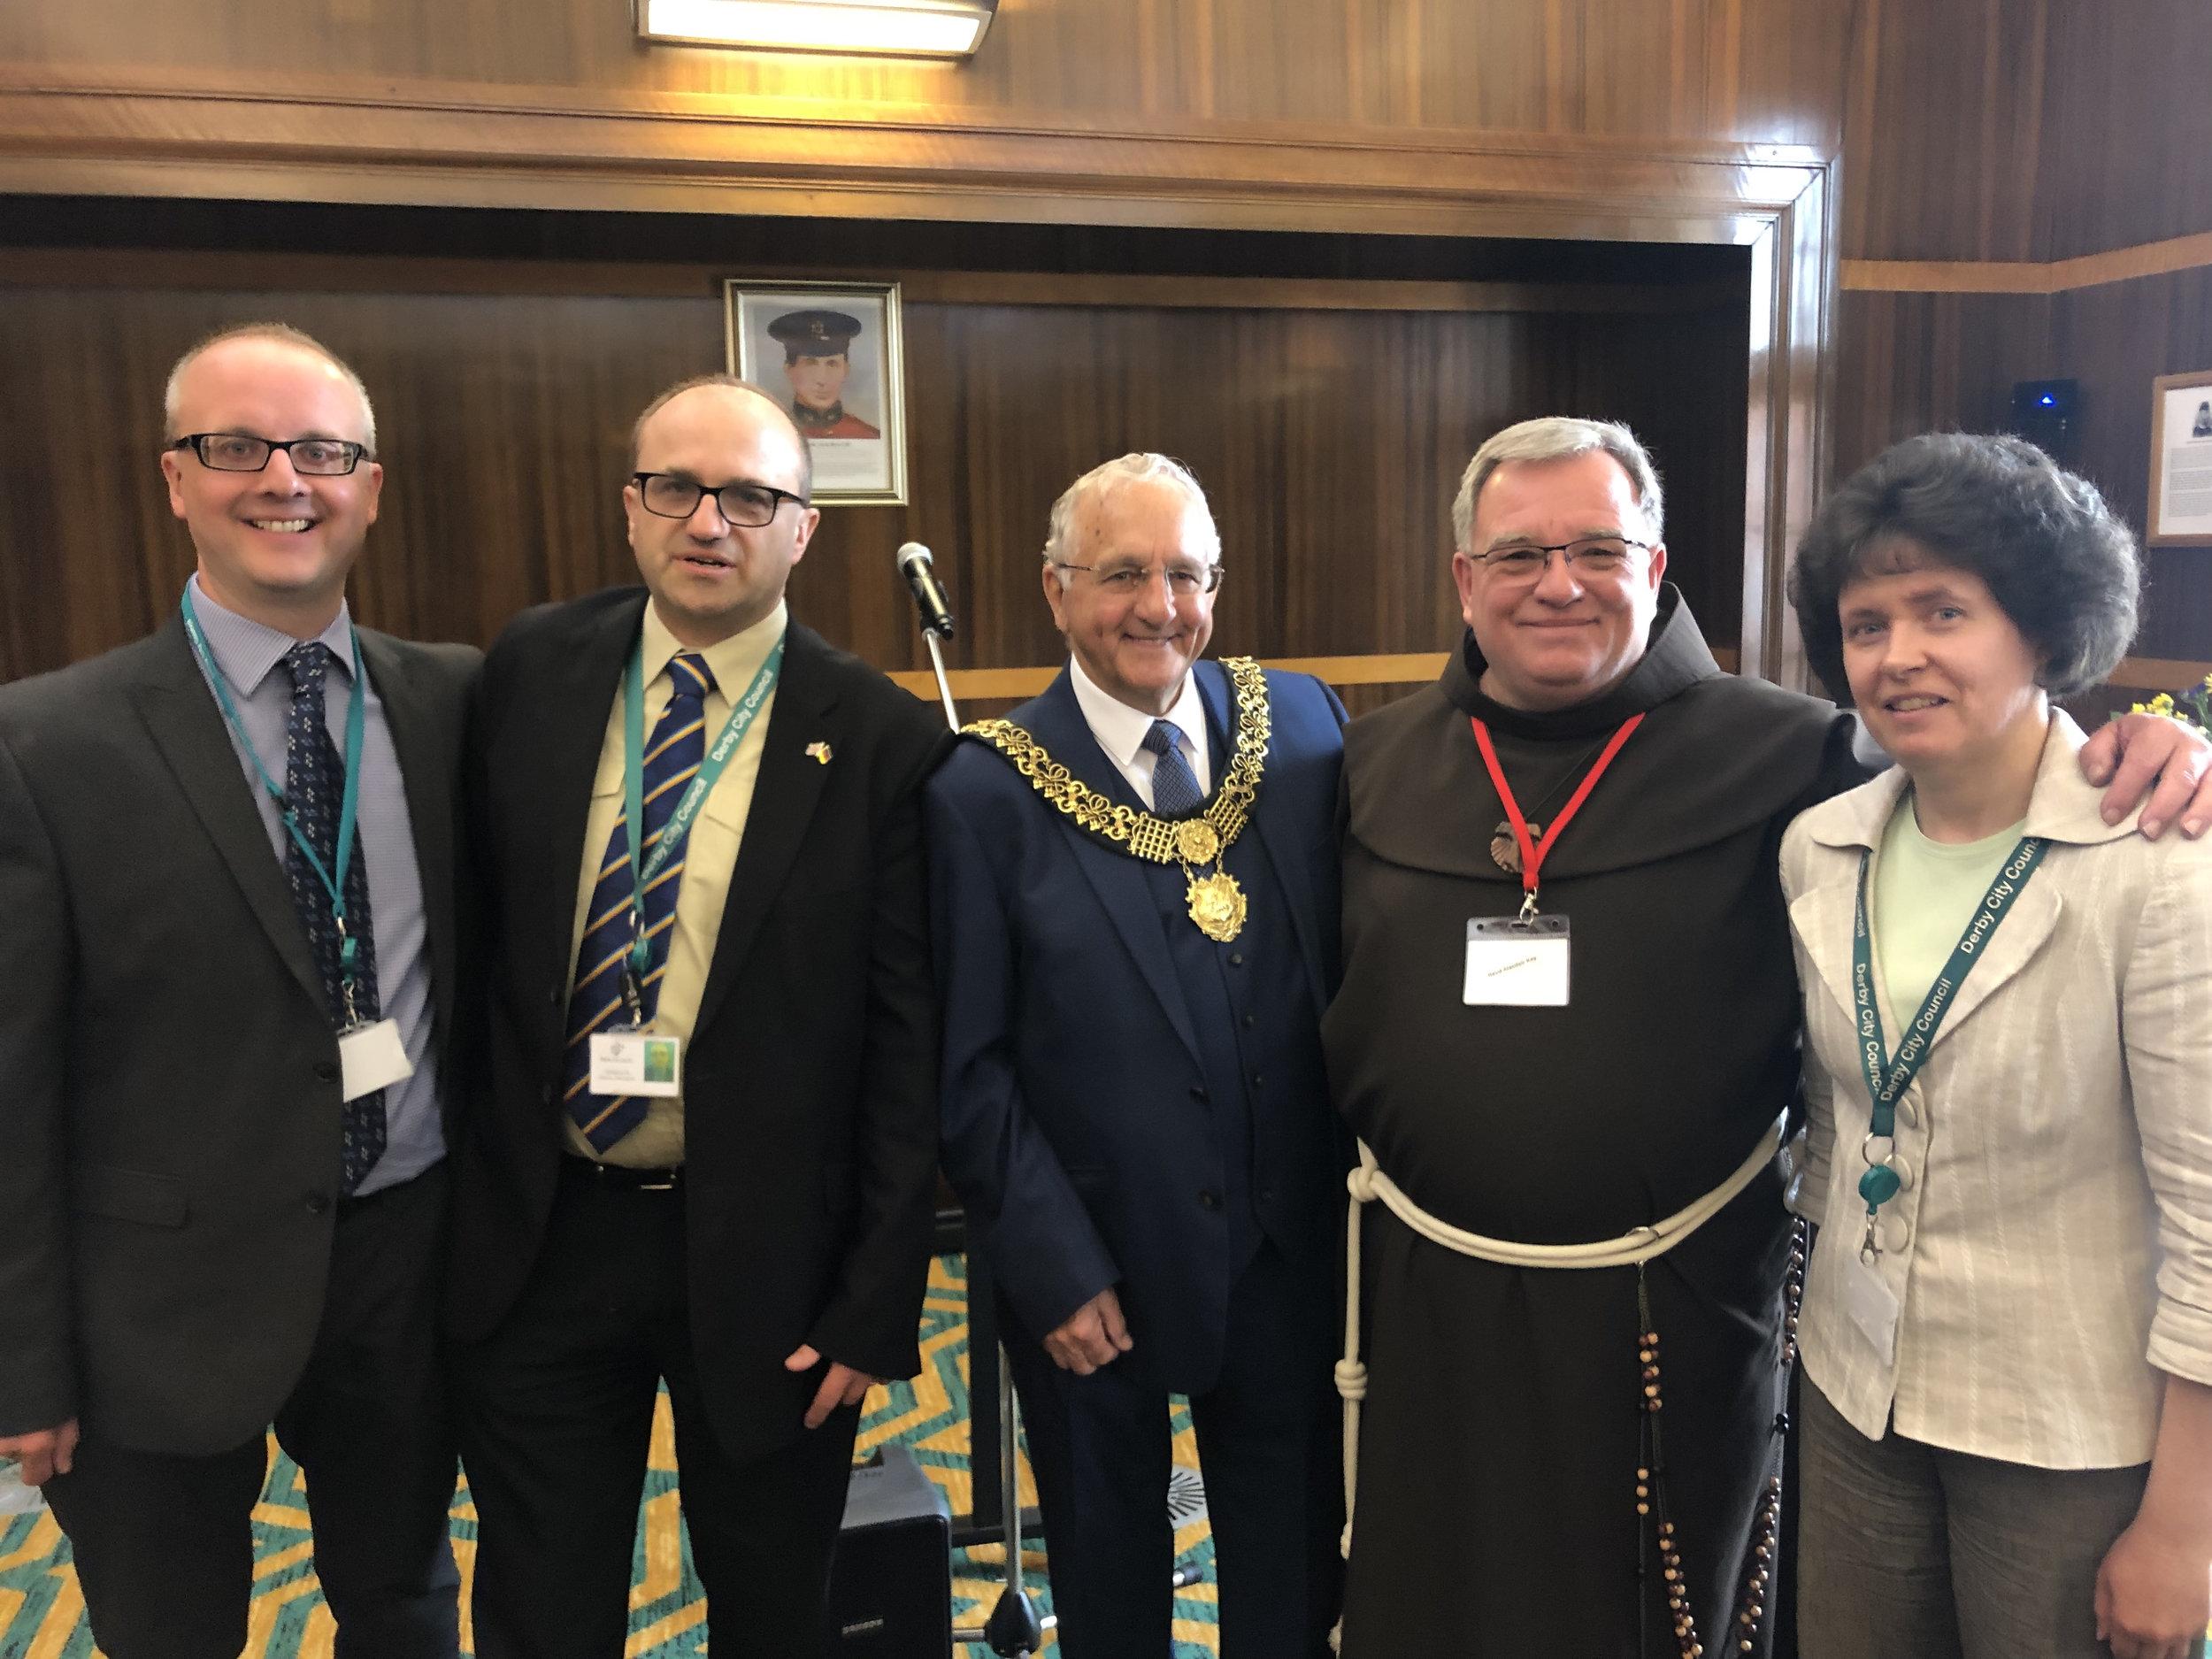 Graham Pyman, Cllr Stephen Willoughby, Mayor of Derby Cllr Frank Harwood, Rev'd Alasdair Kay and Cllr Ruth Skelton (L-R)